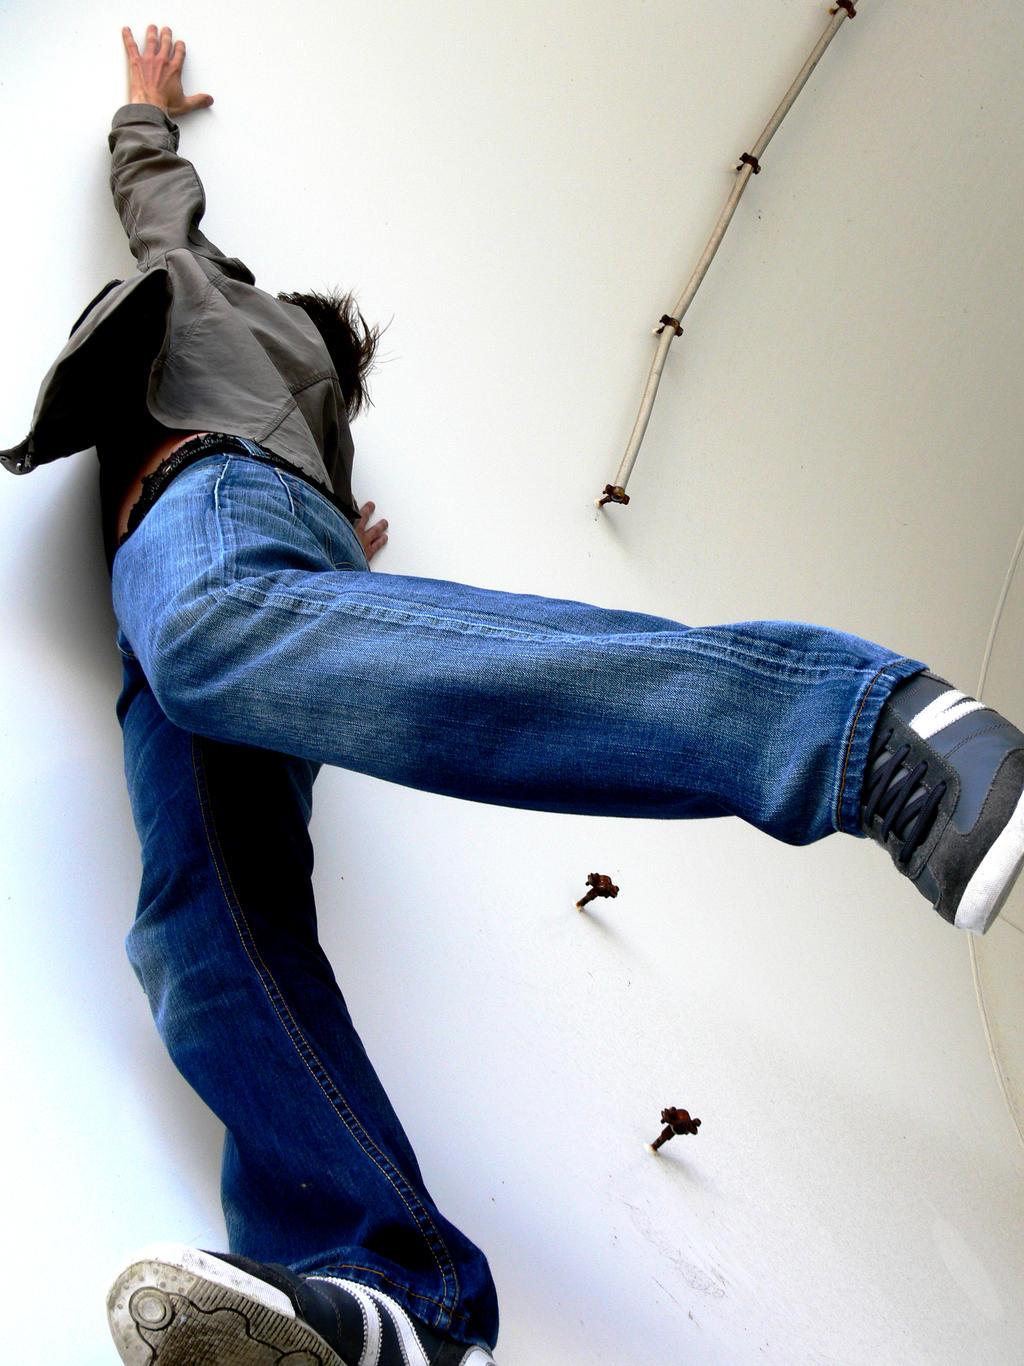 Stock 042 - Paul Falling by senzostock